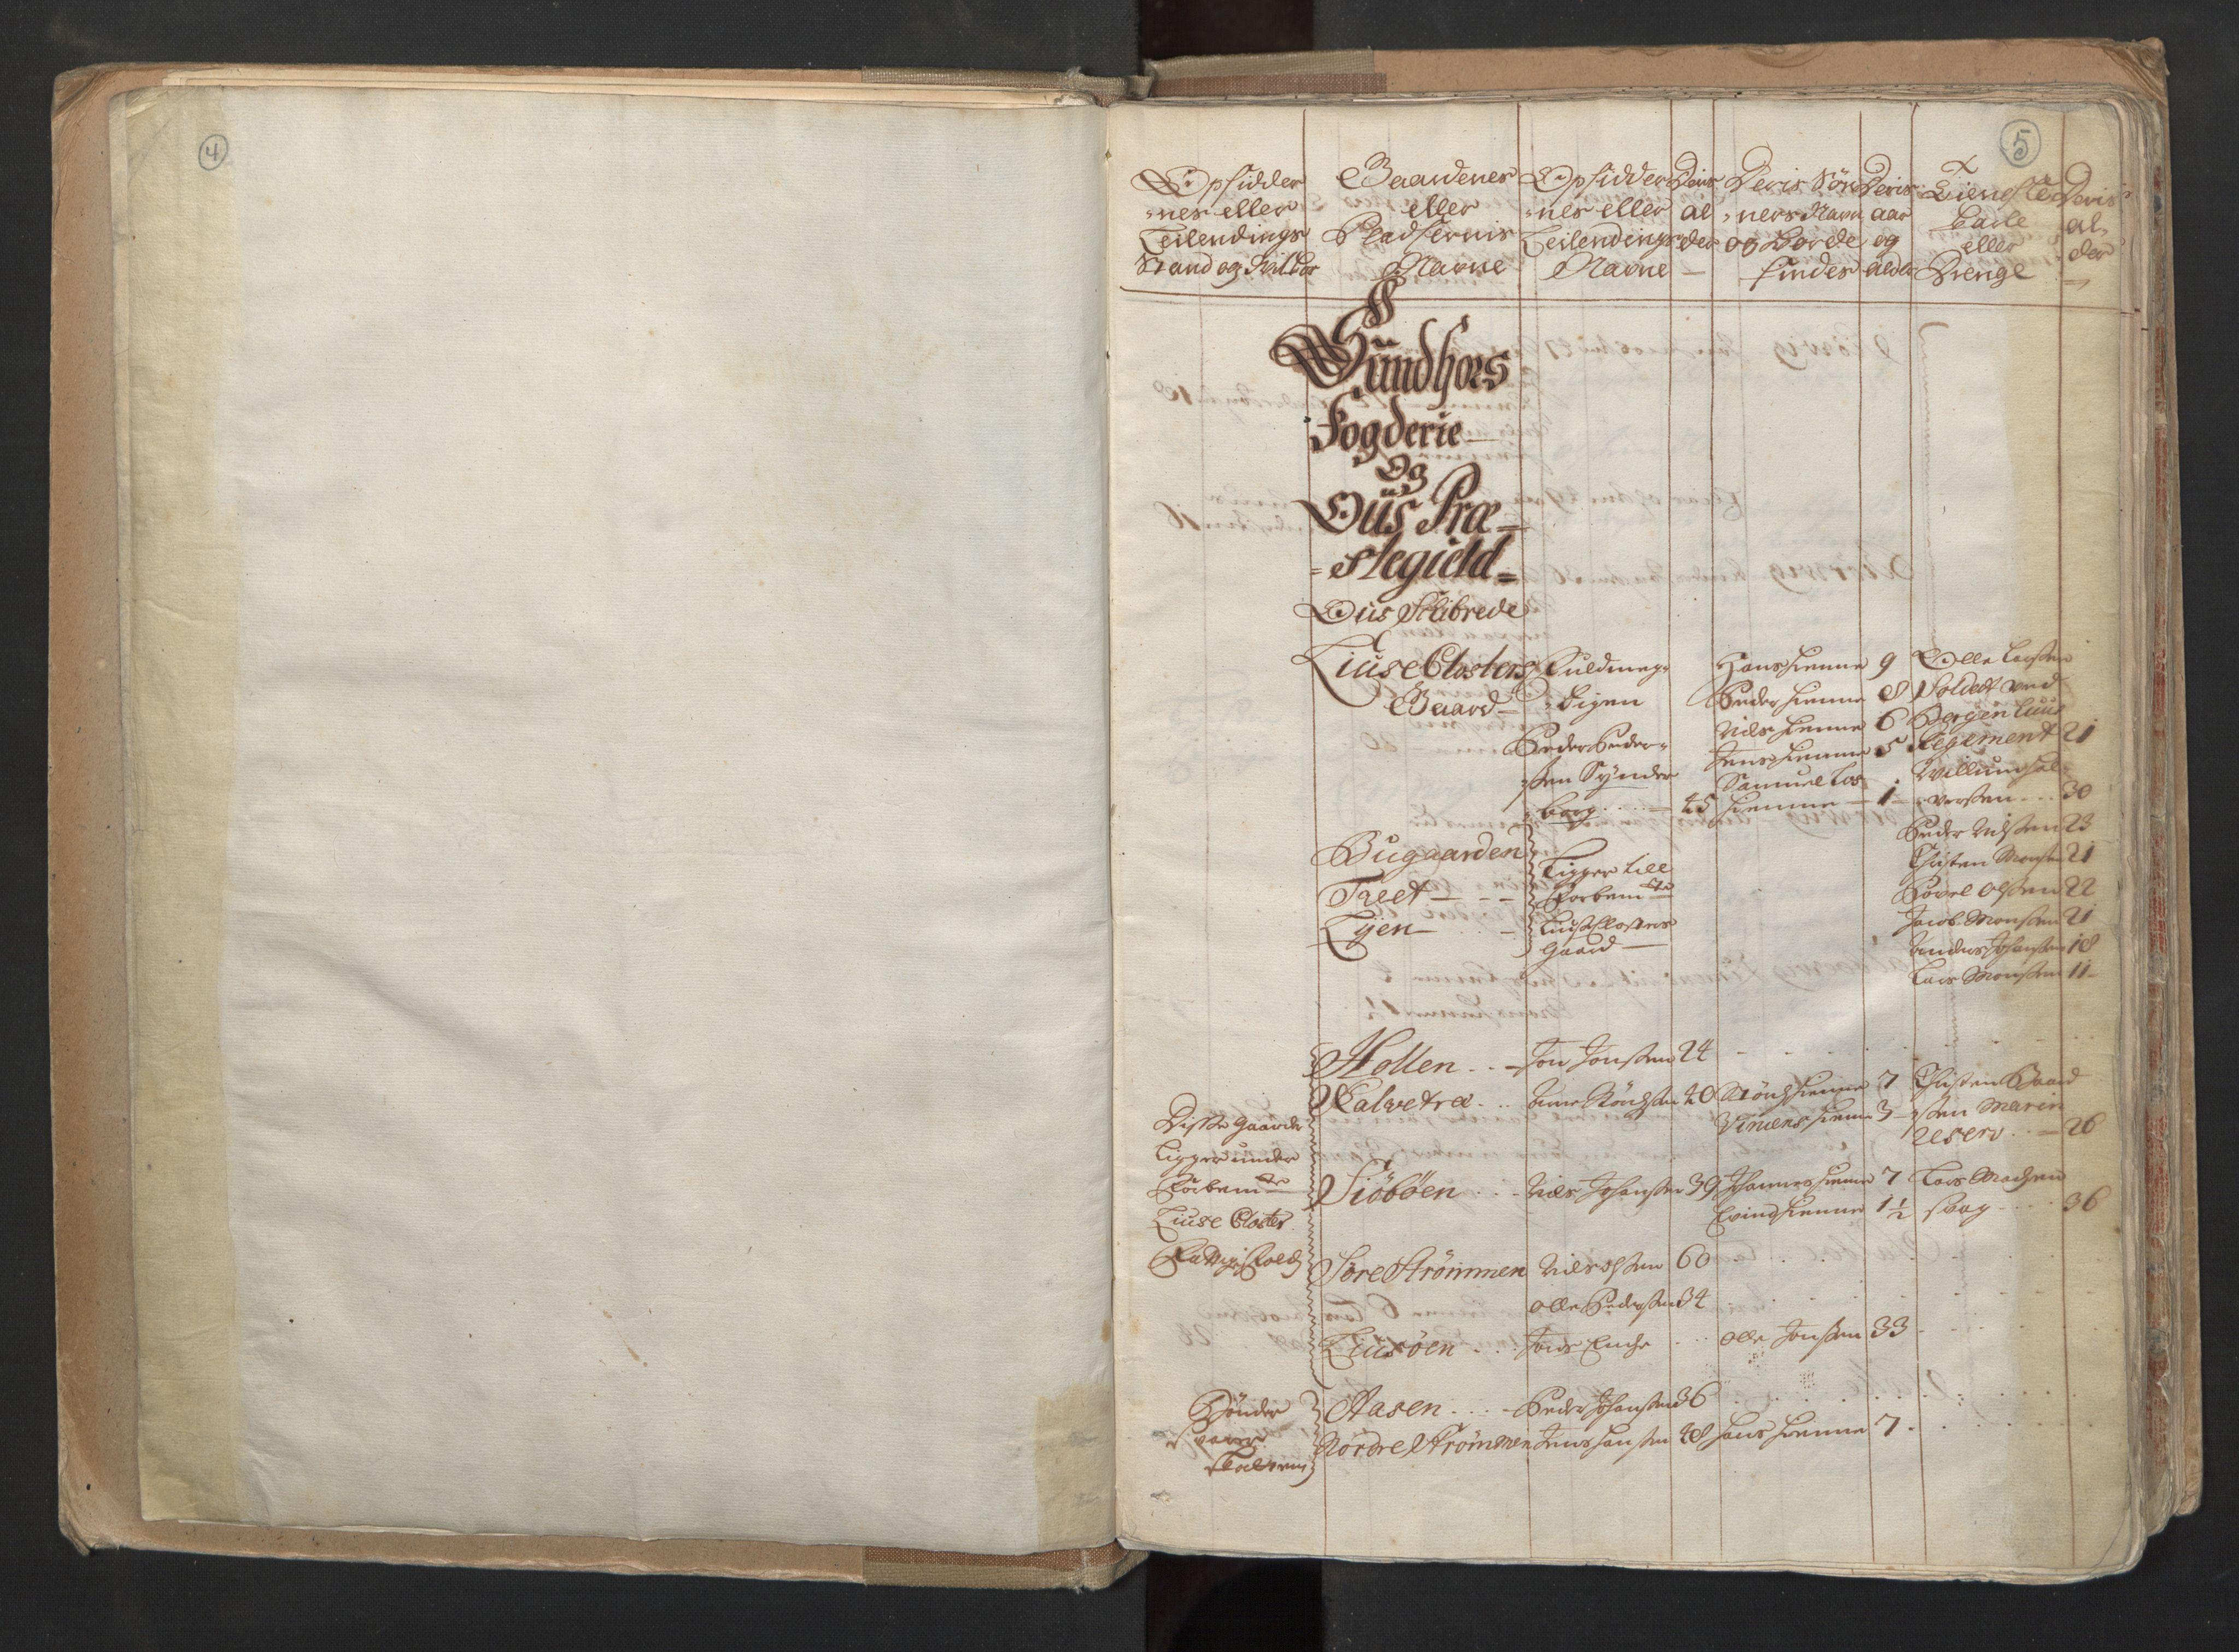 RA, Manntallet 1701, nr. 6: Sunnhordland fogderi og Hardanger fogderi, 1701, s. 4-5